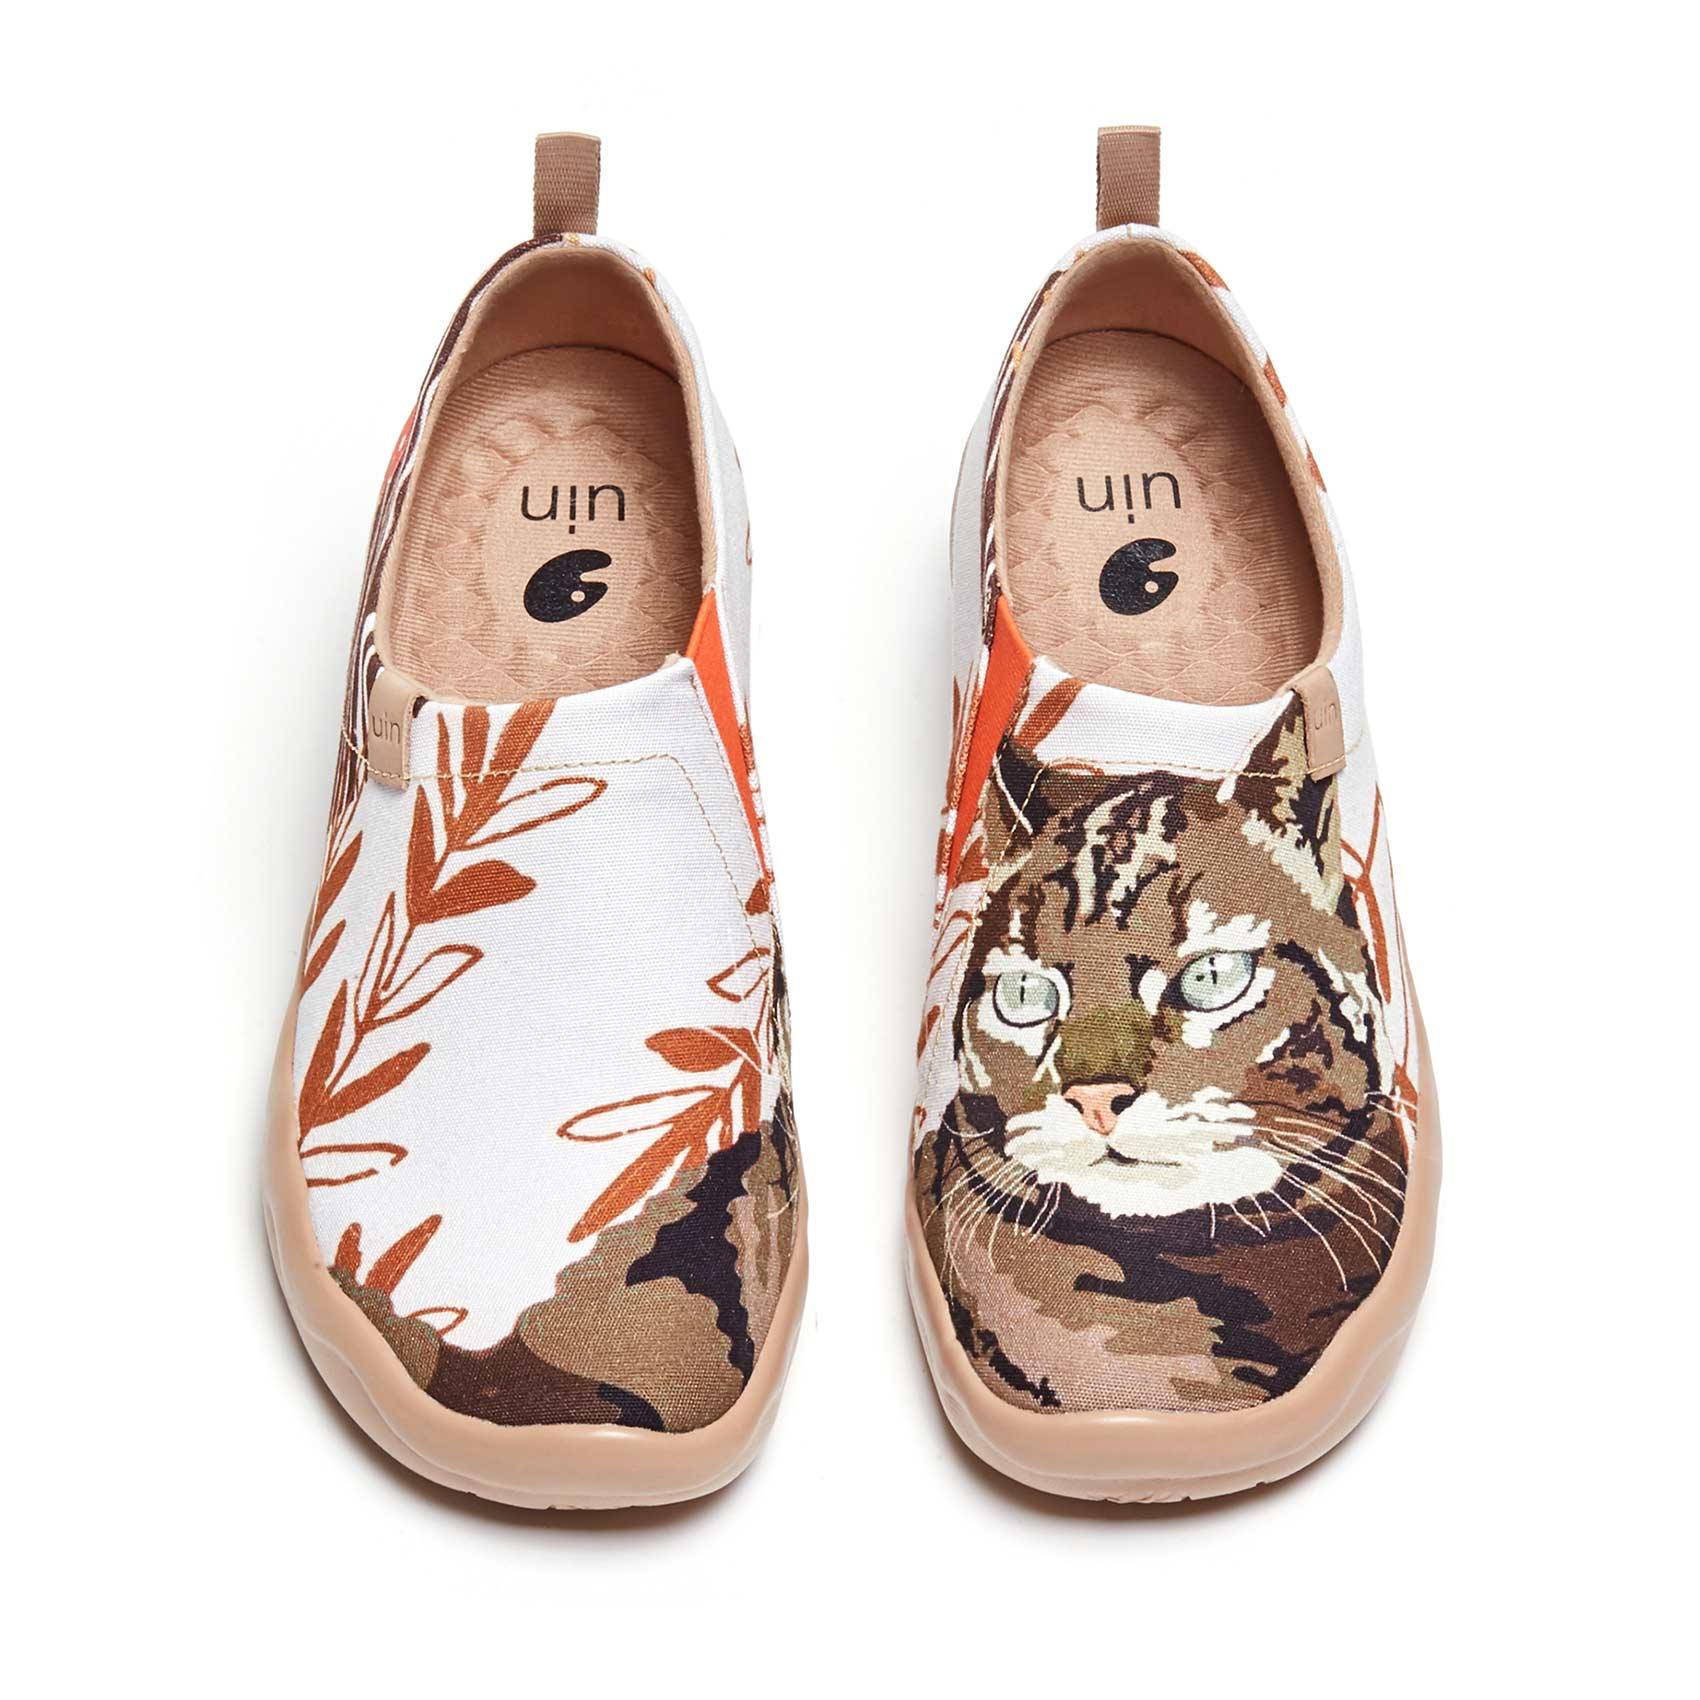 UIN-أحذية رياضية نسائية خفيفة الوزن سهلة الارتداء ، أحذية مشي ، أحذية سفر ، أحذية بدون كعب ، كلب لطيف